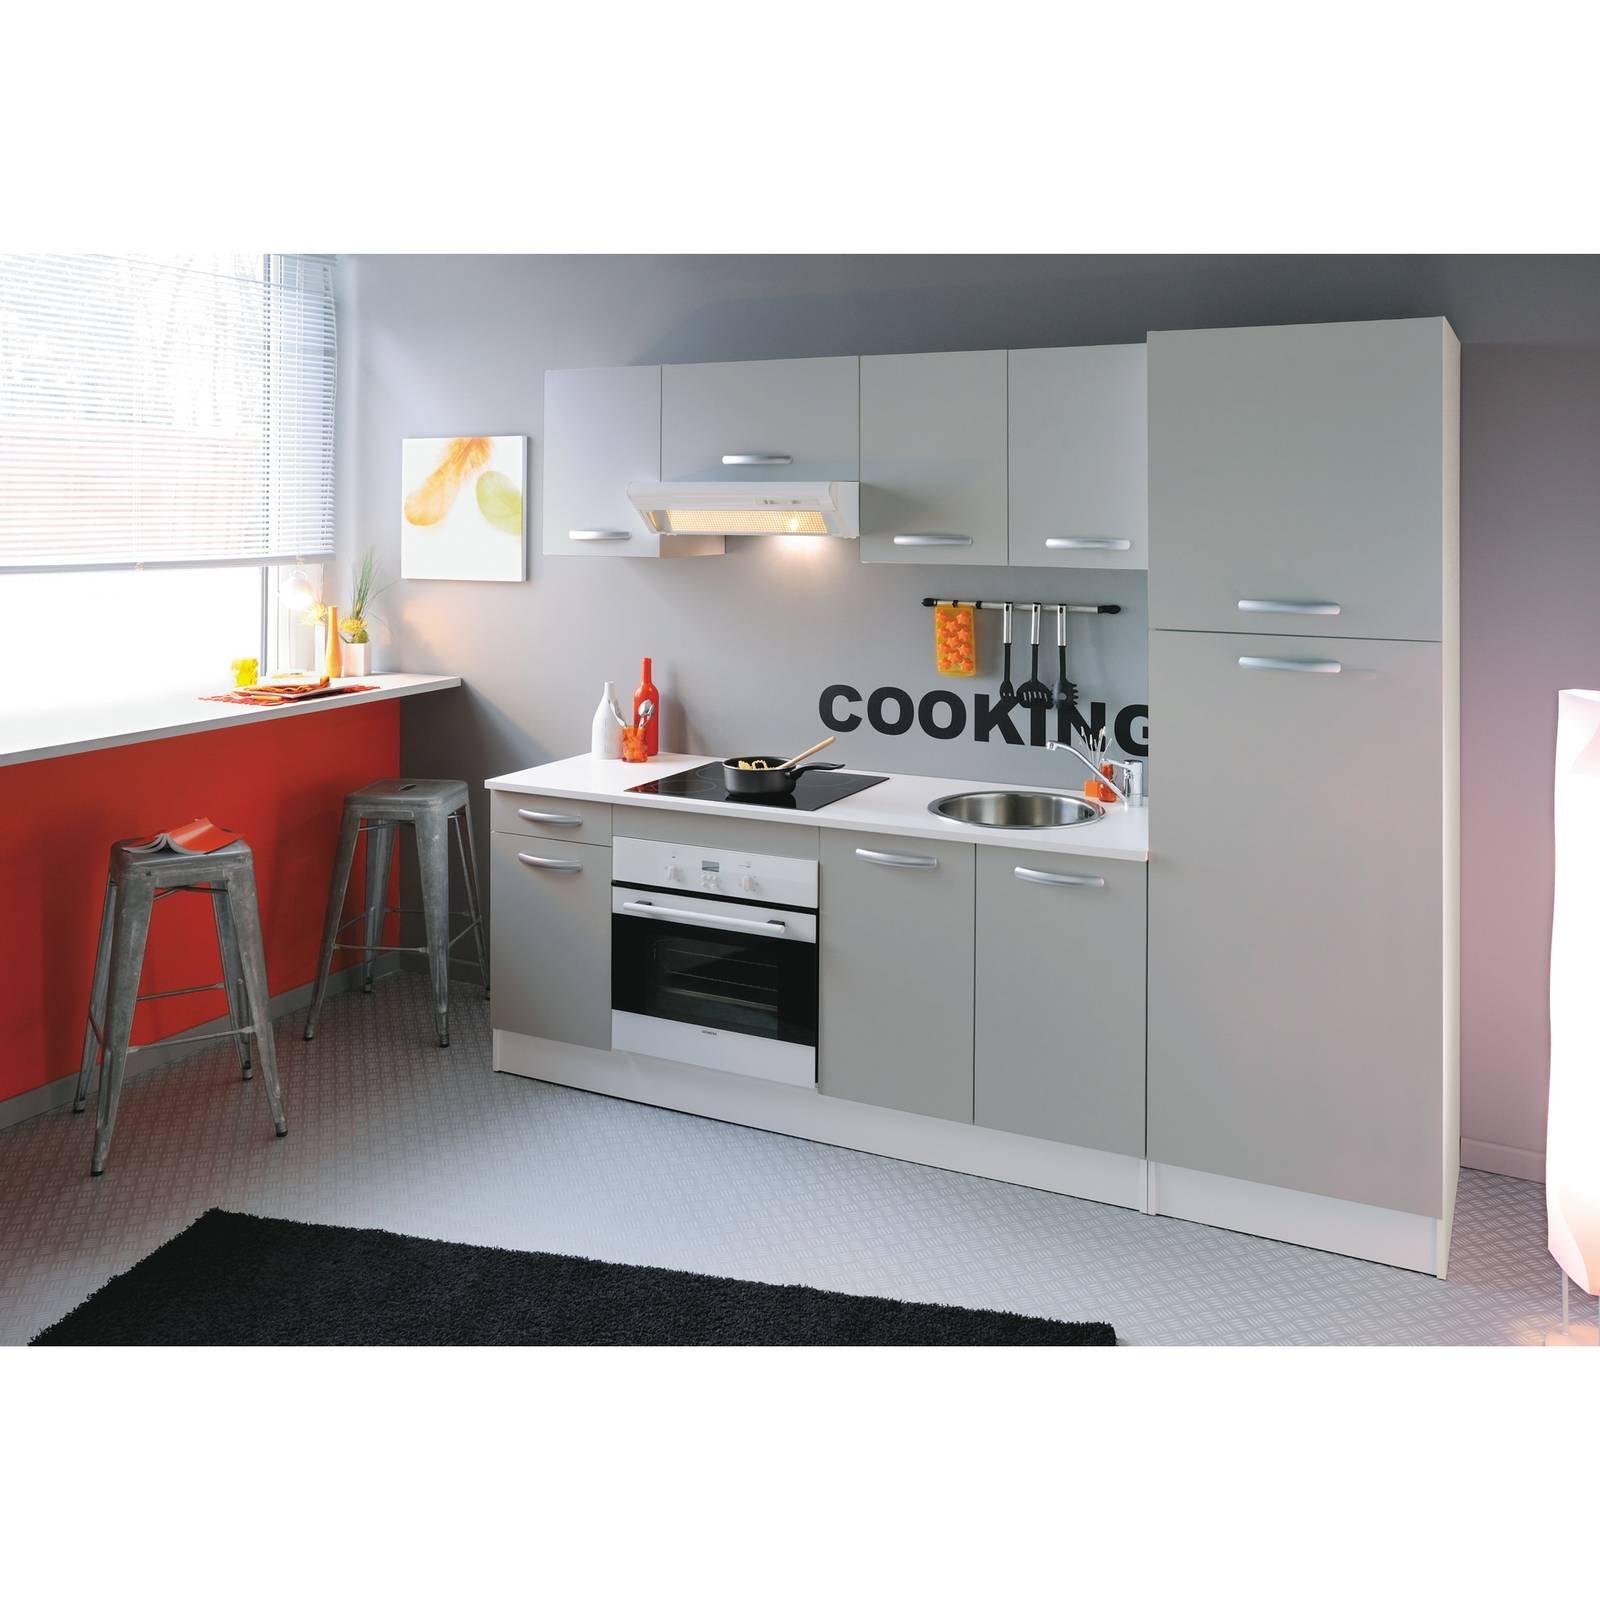 leroy merlin spring cucina con finestra - Cose di Casa